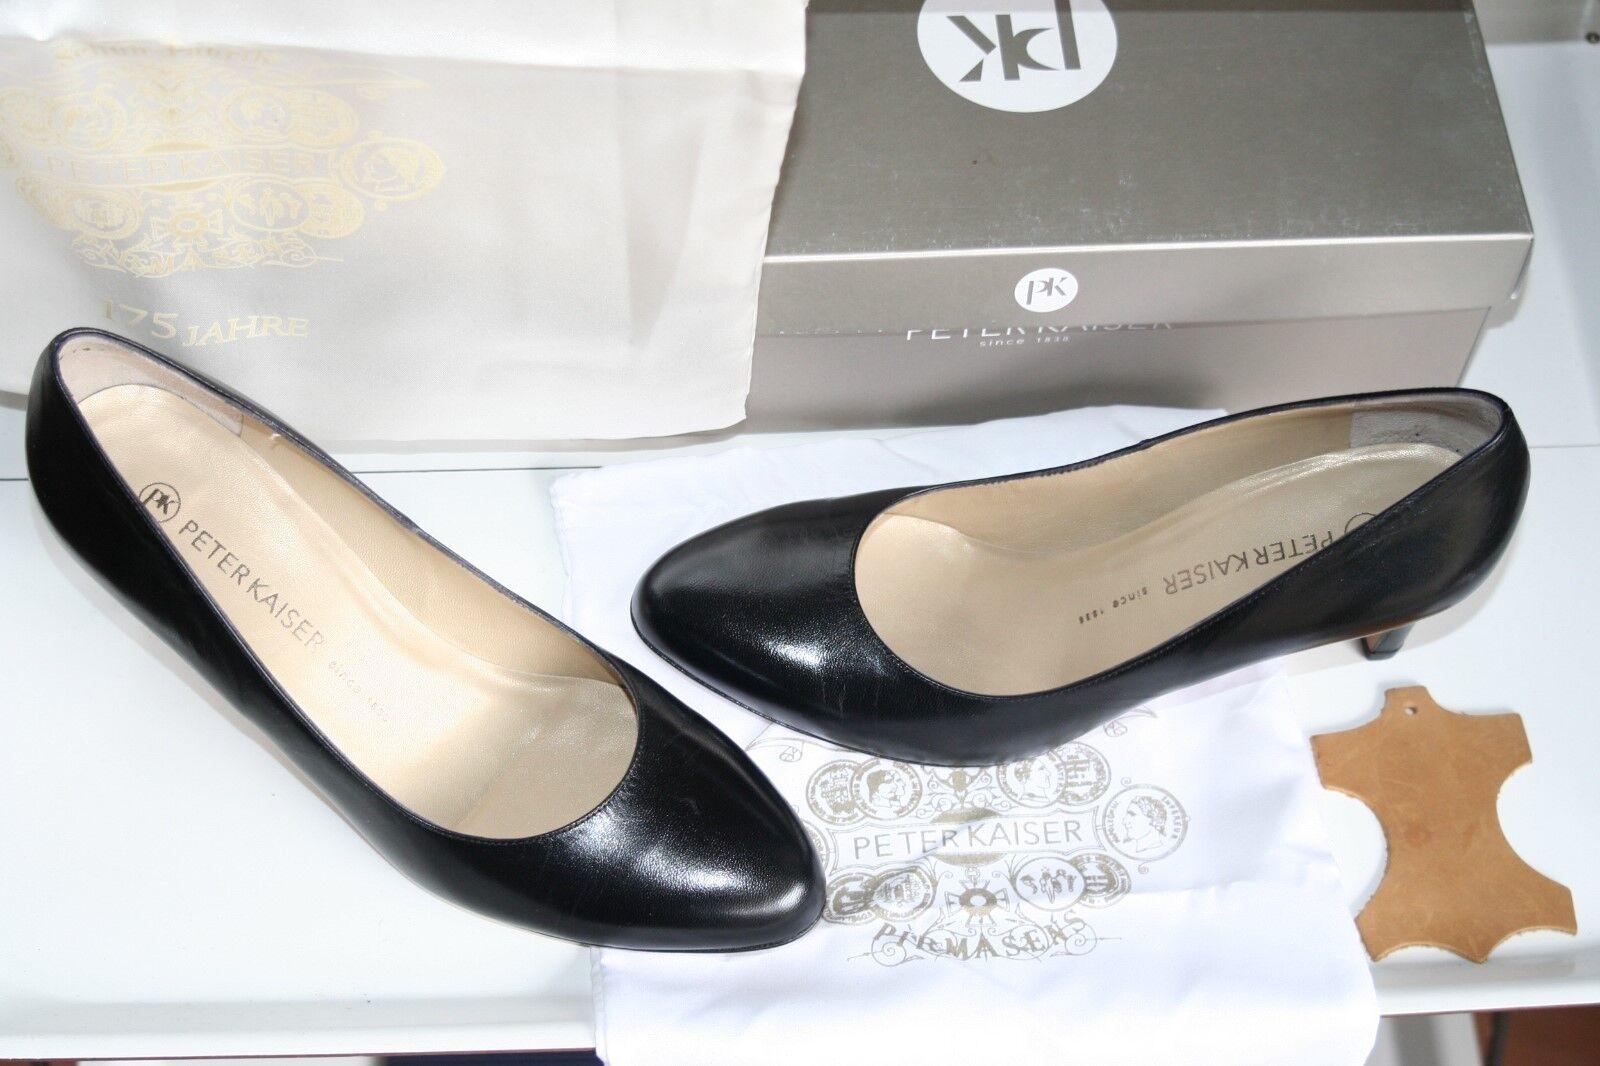 Women's Shoes Intelligent Ecco Damen Eu 39 Us 8-8.5 Touch Schwarzes Leder Plateau Sandalen Neu